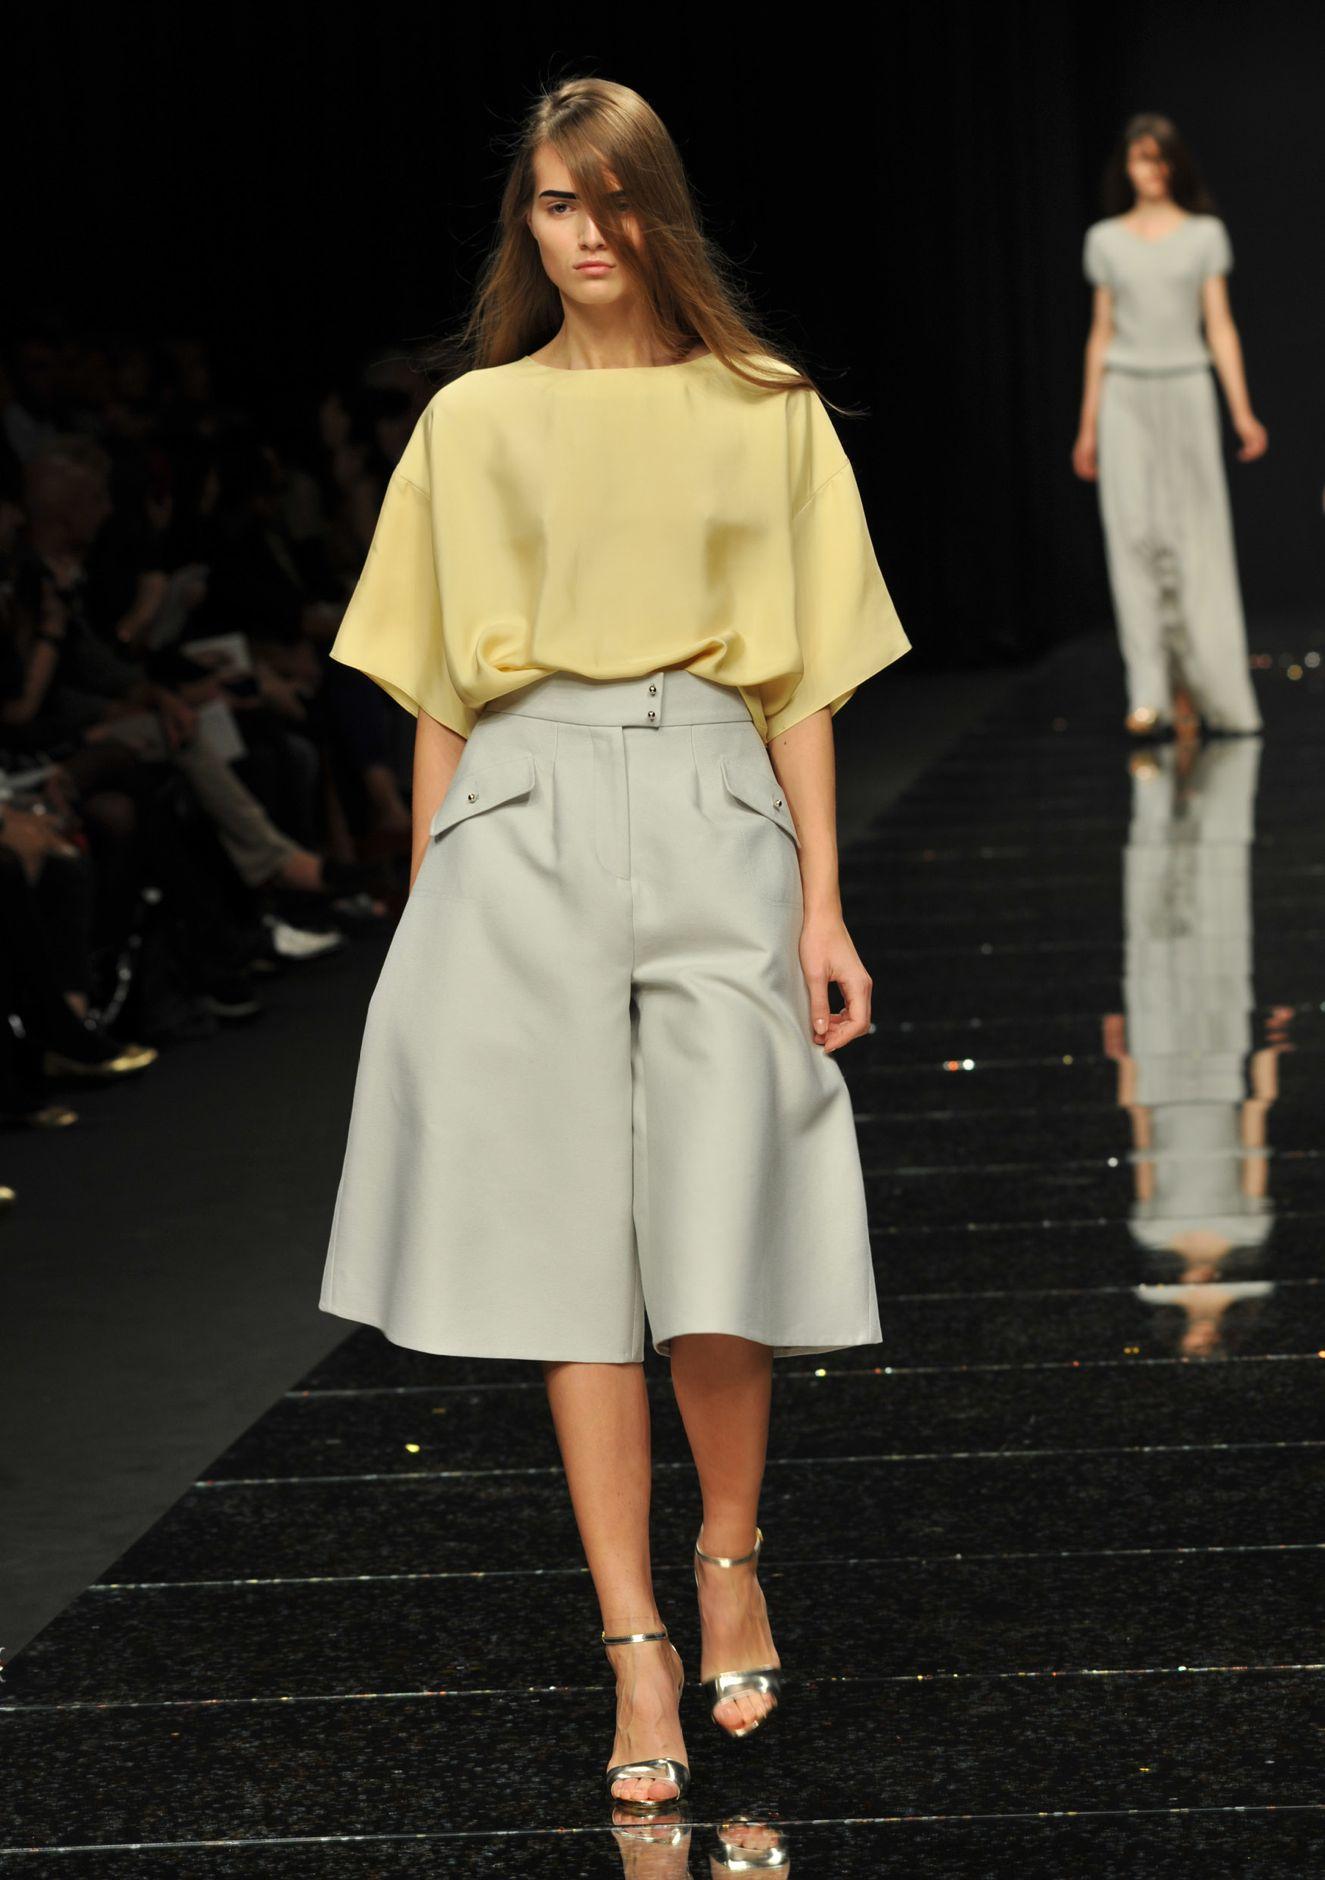 Anteprima Summer 2013 Collection Milano Fashion Week